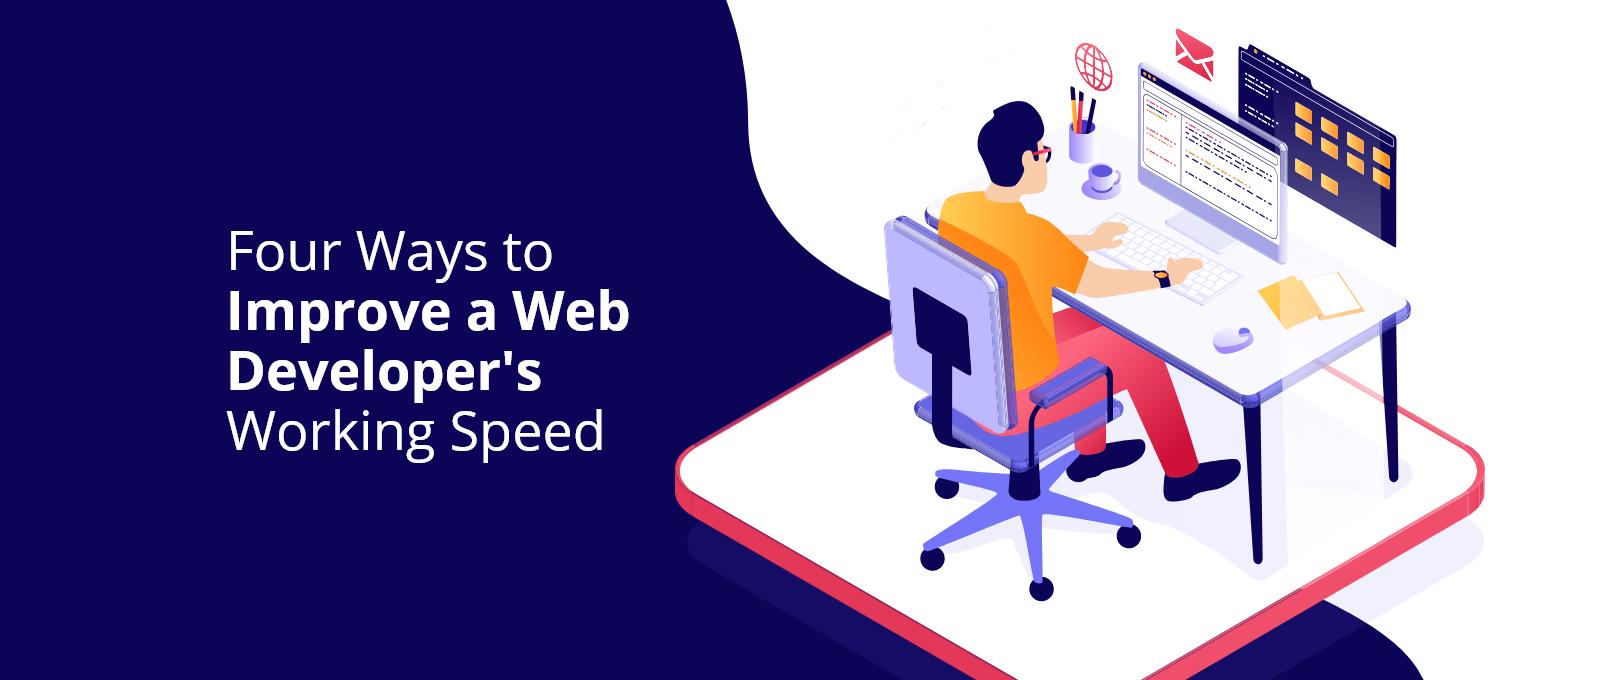 Four Ways to Improve a Web Developer's Working Speed